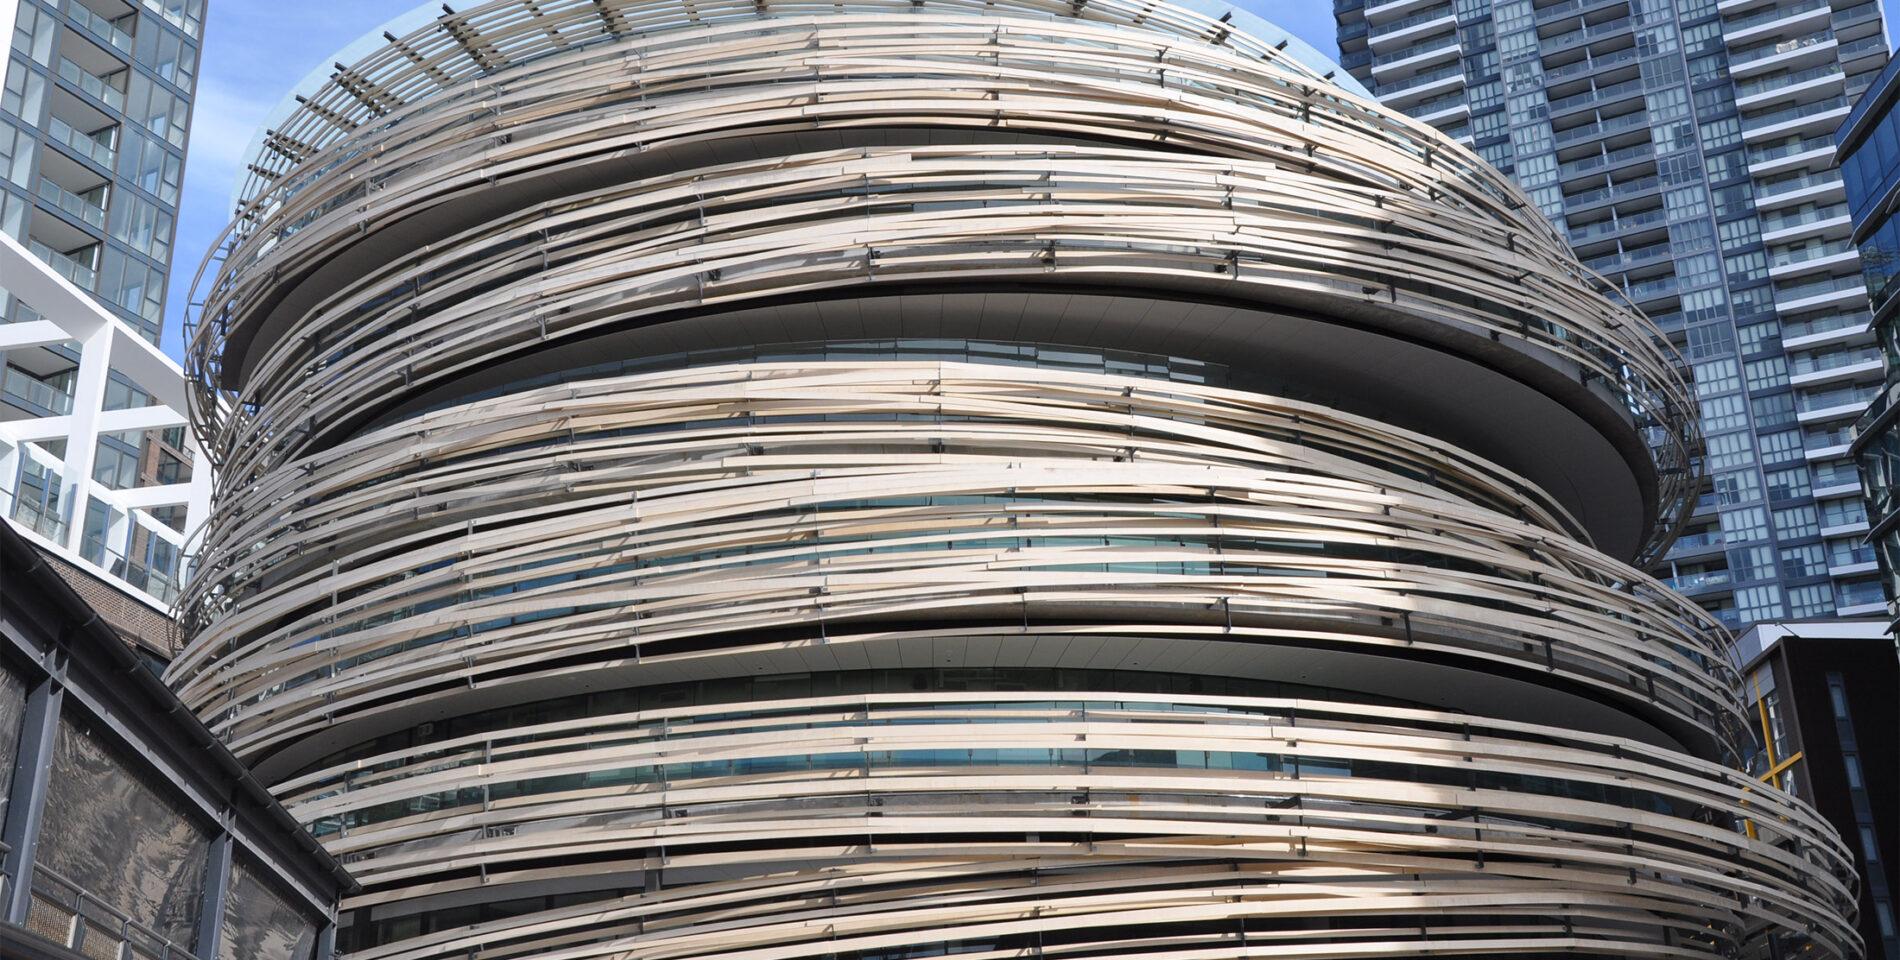 Accoya wood wrapped around the Darling Exchange, Sydney.